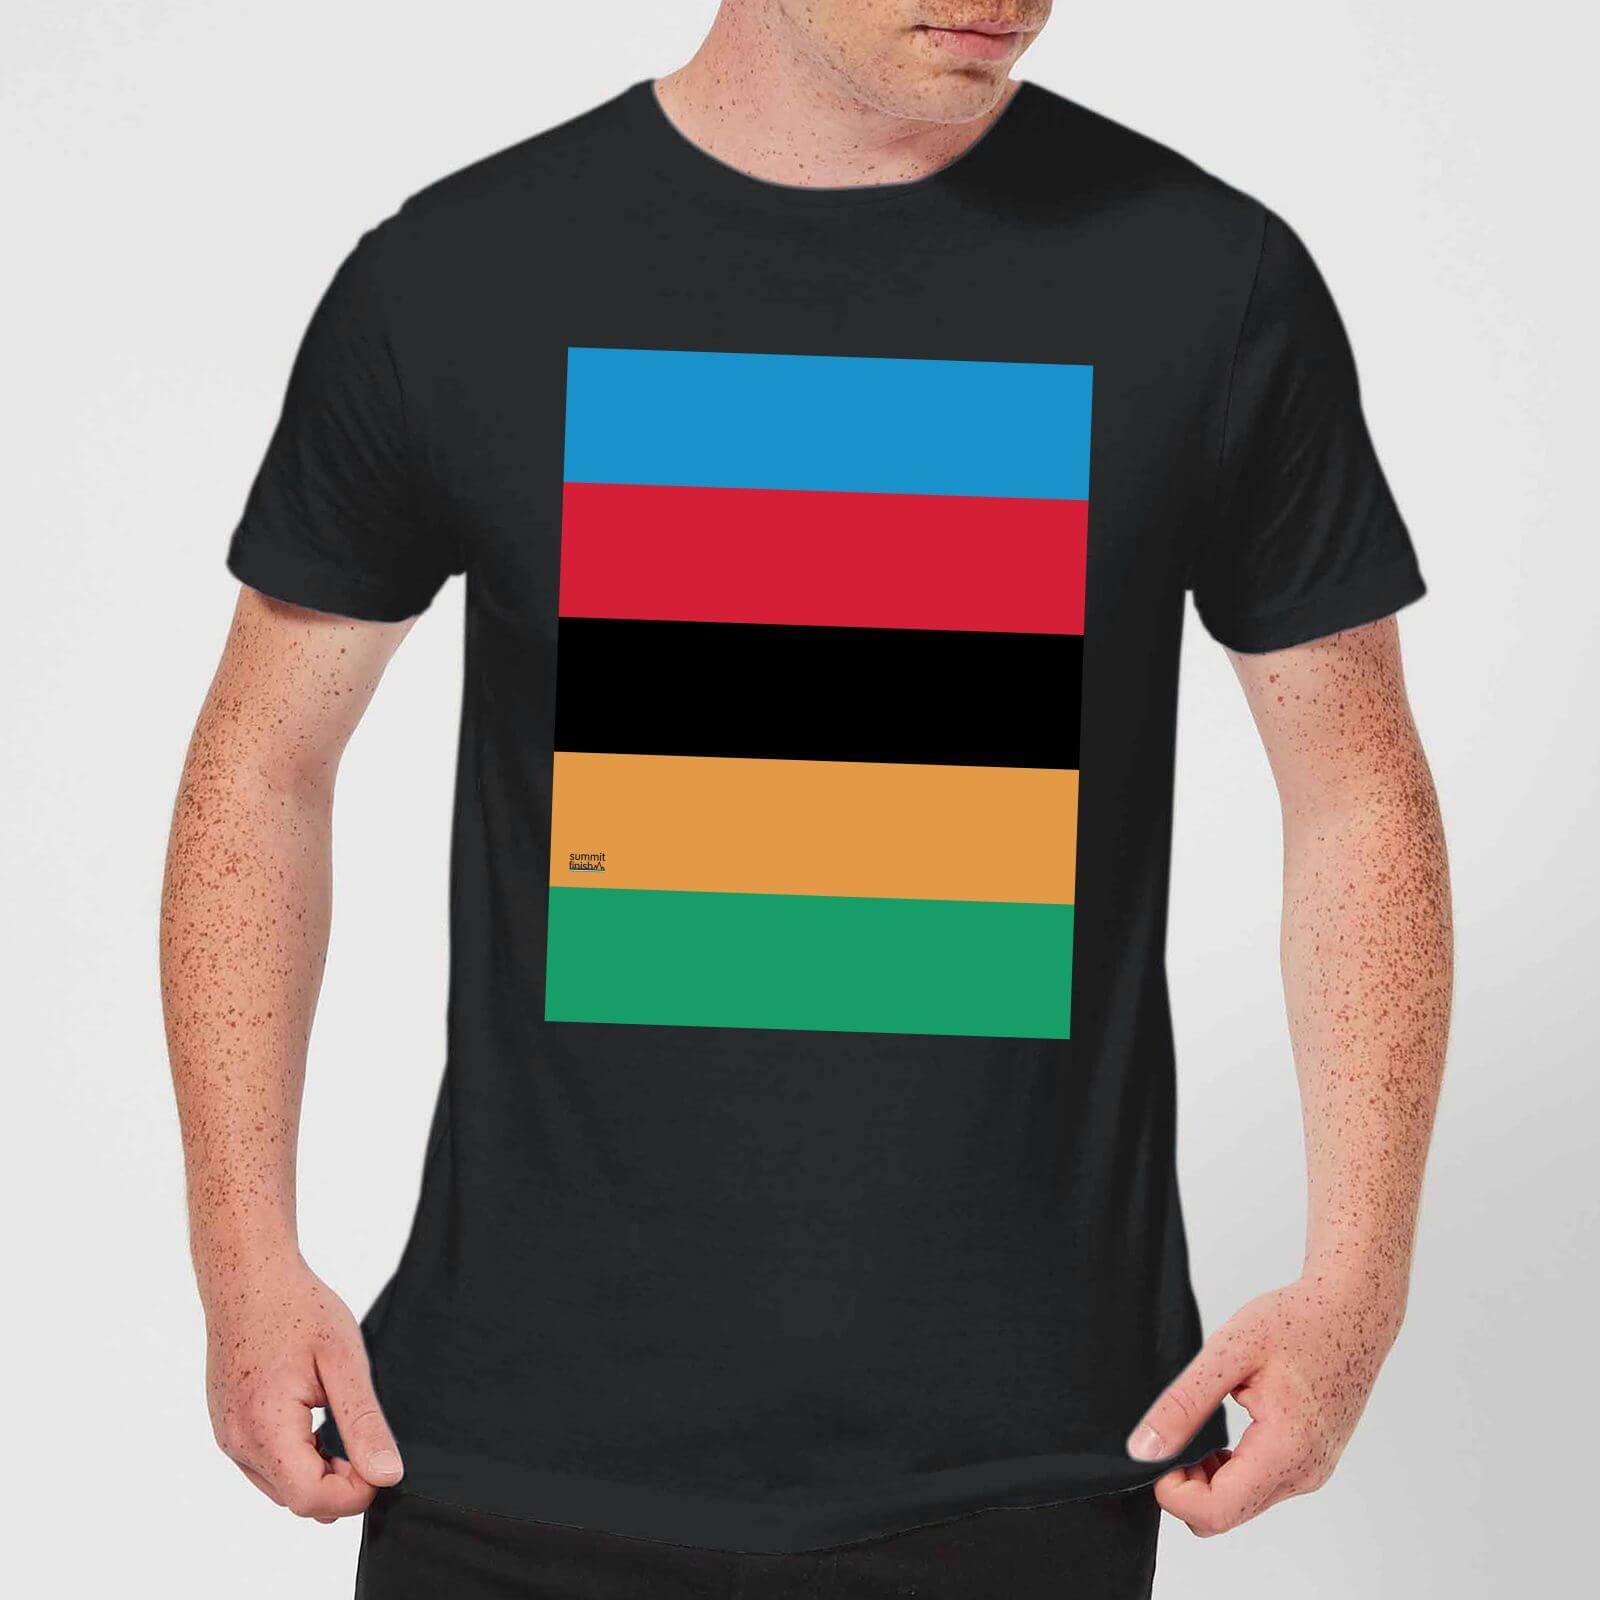 Summit Finish World Champion Stripes Men's T-Shirt - Black - 3XL - Black